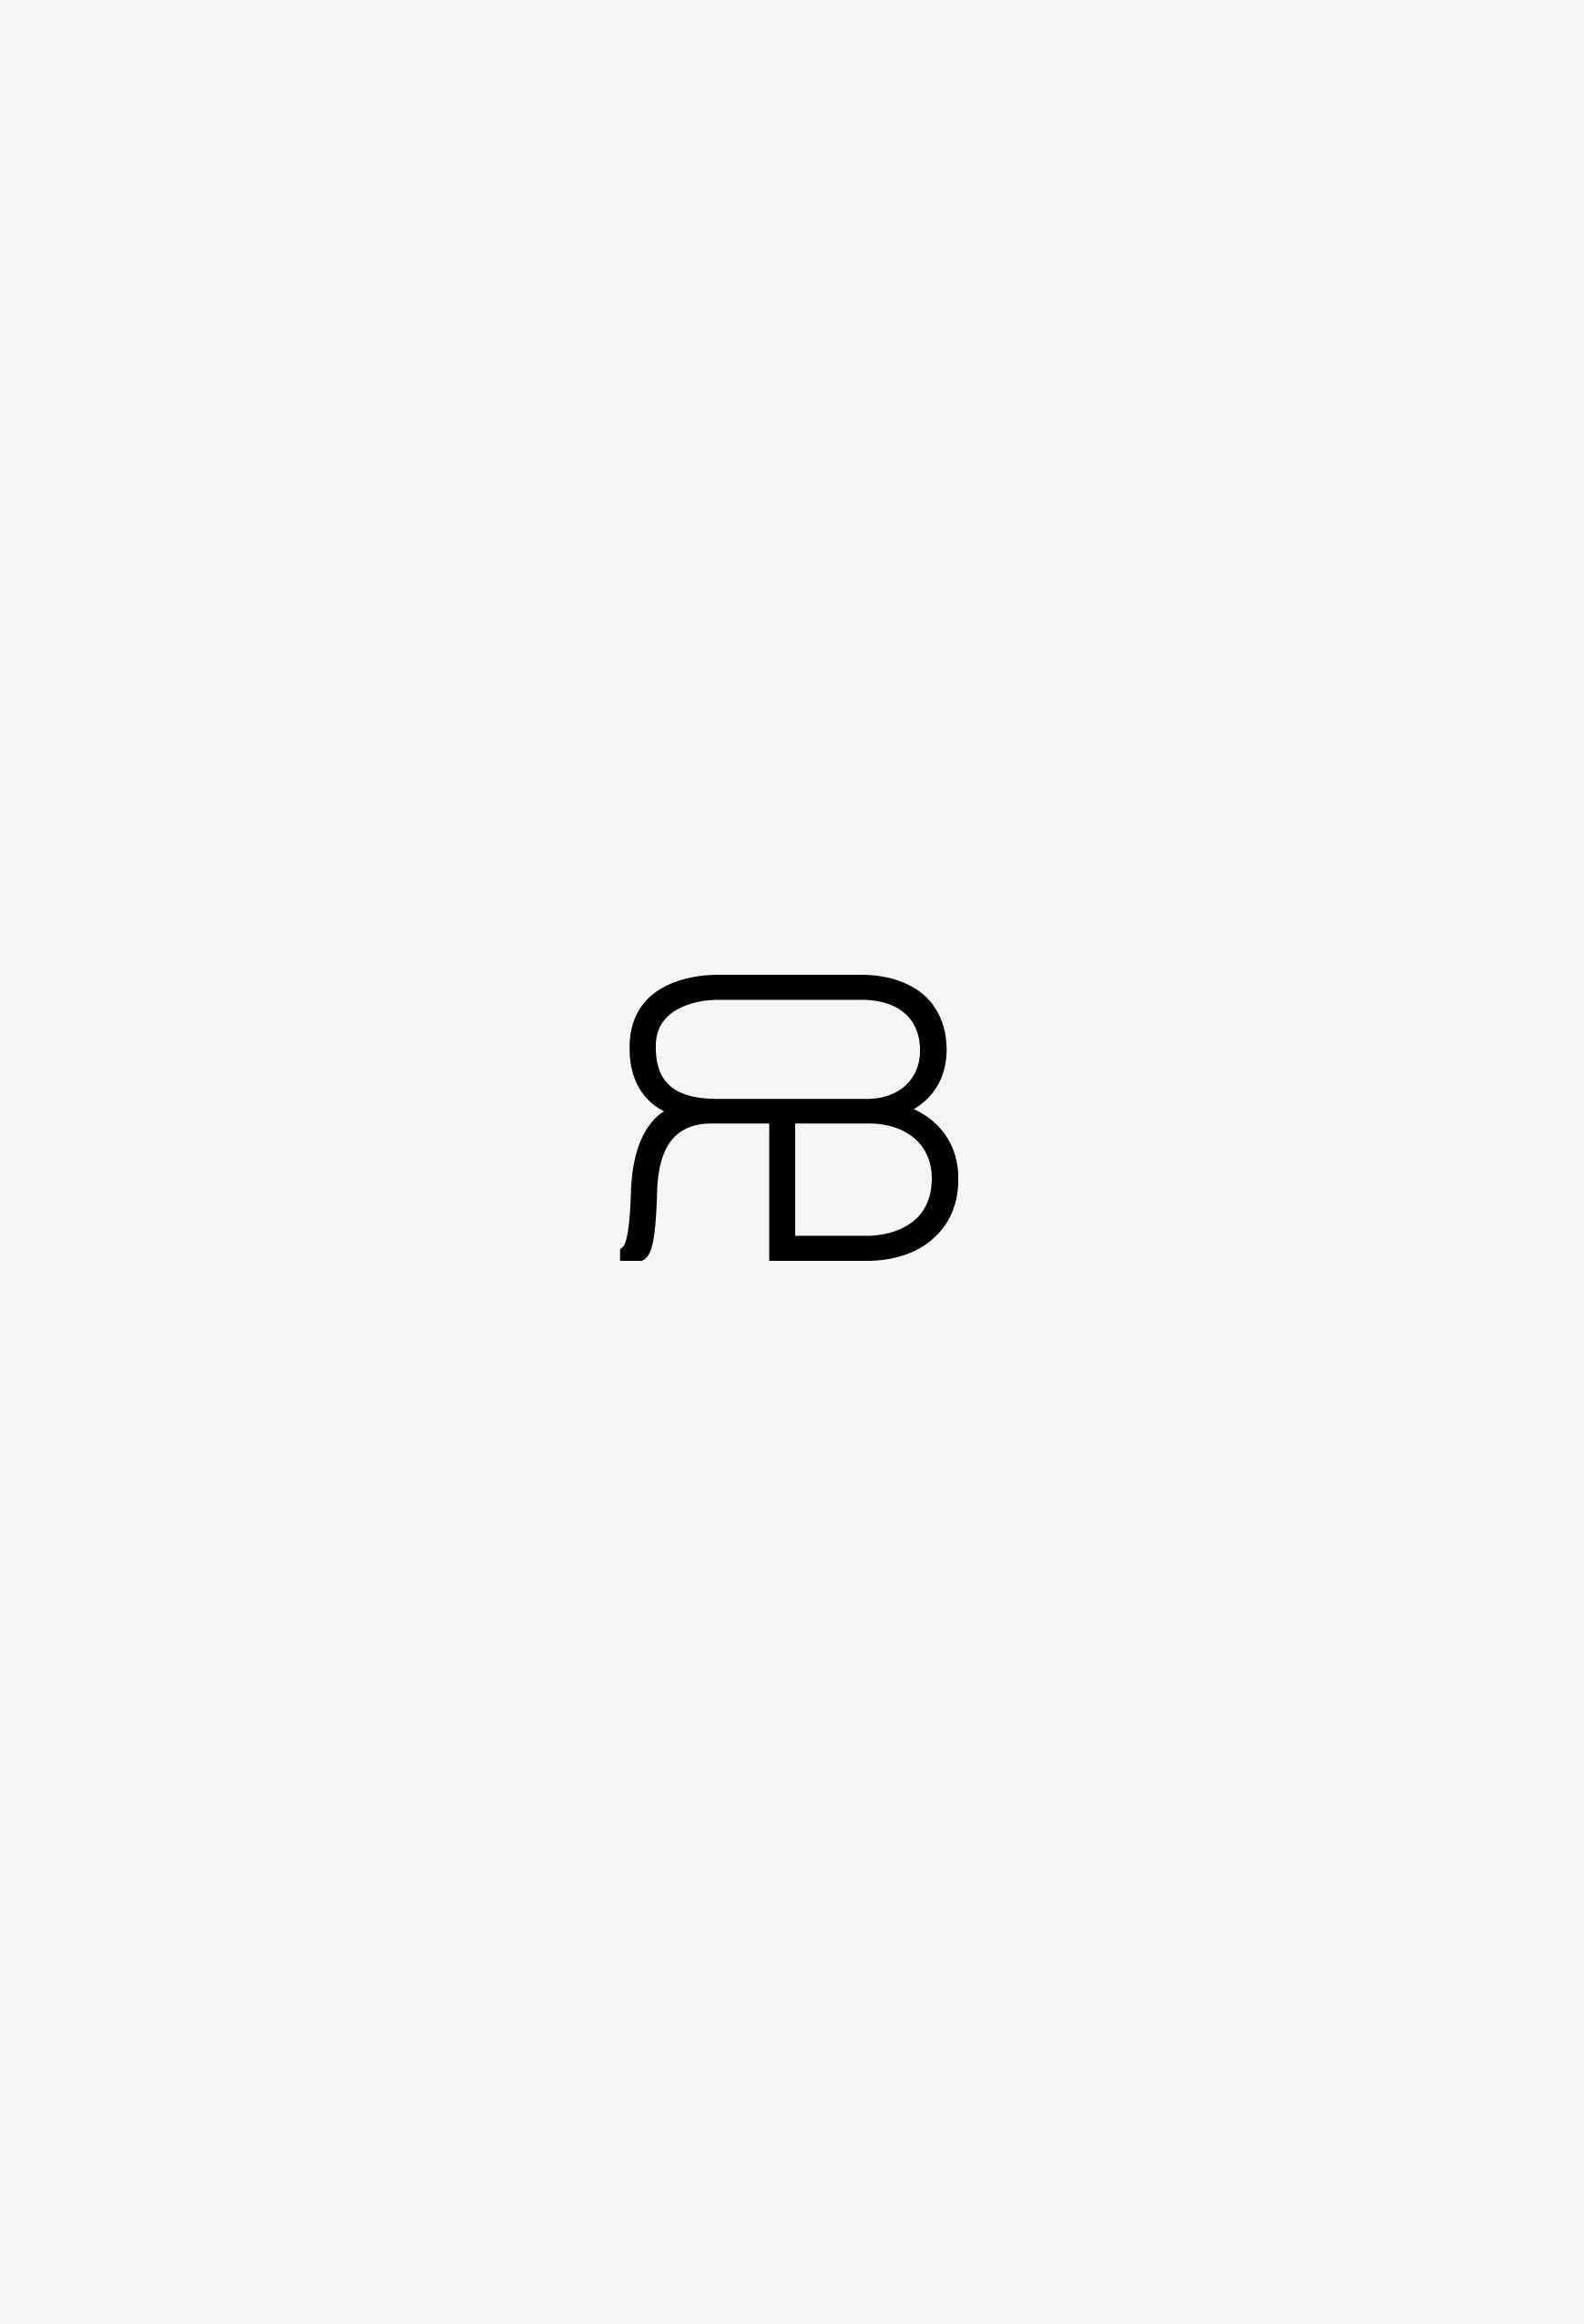 raluca buzura monogram black on white